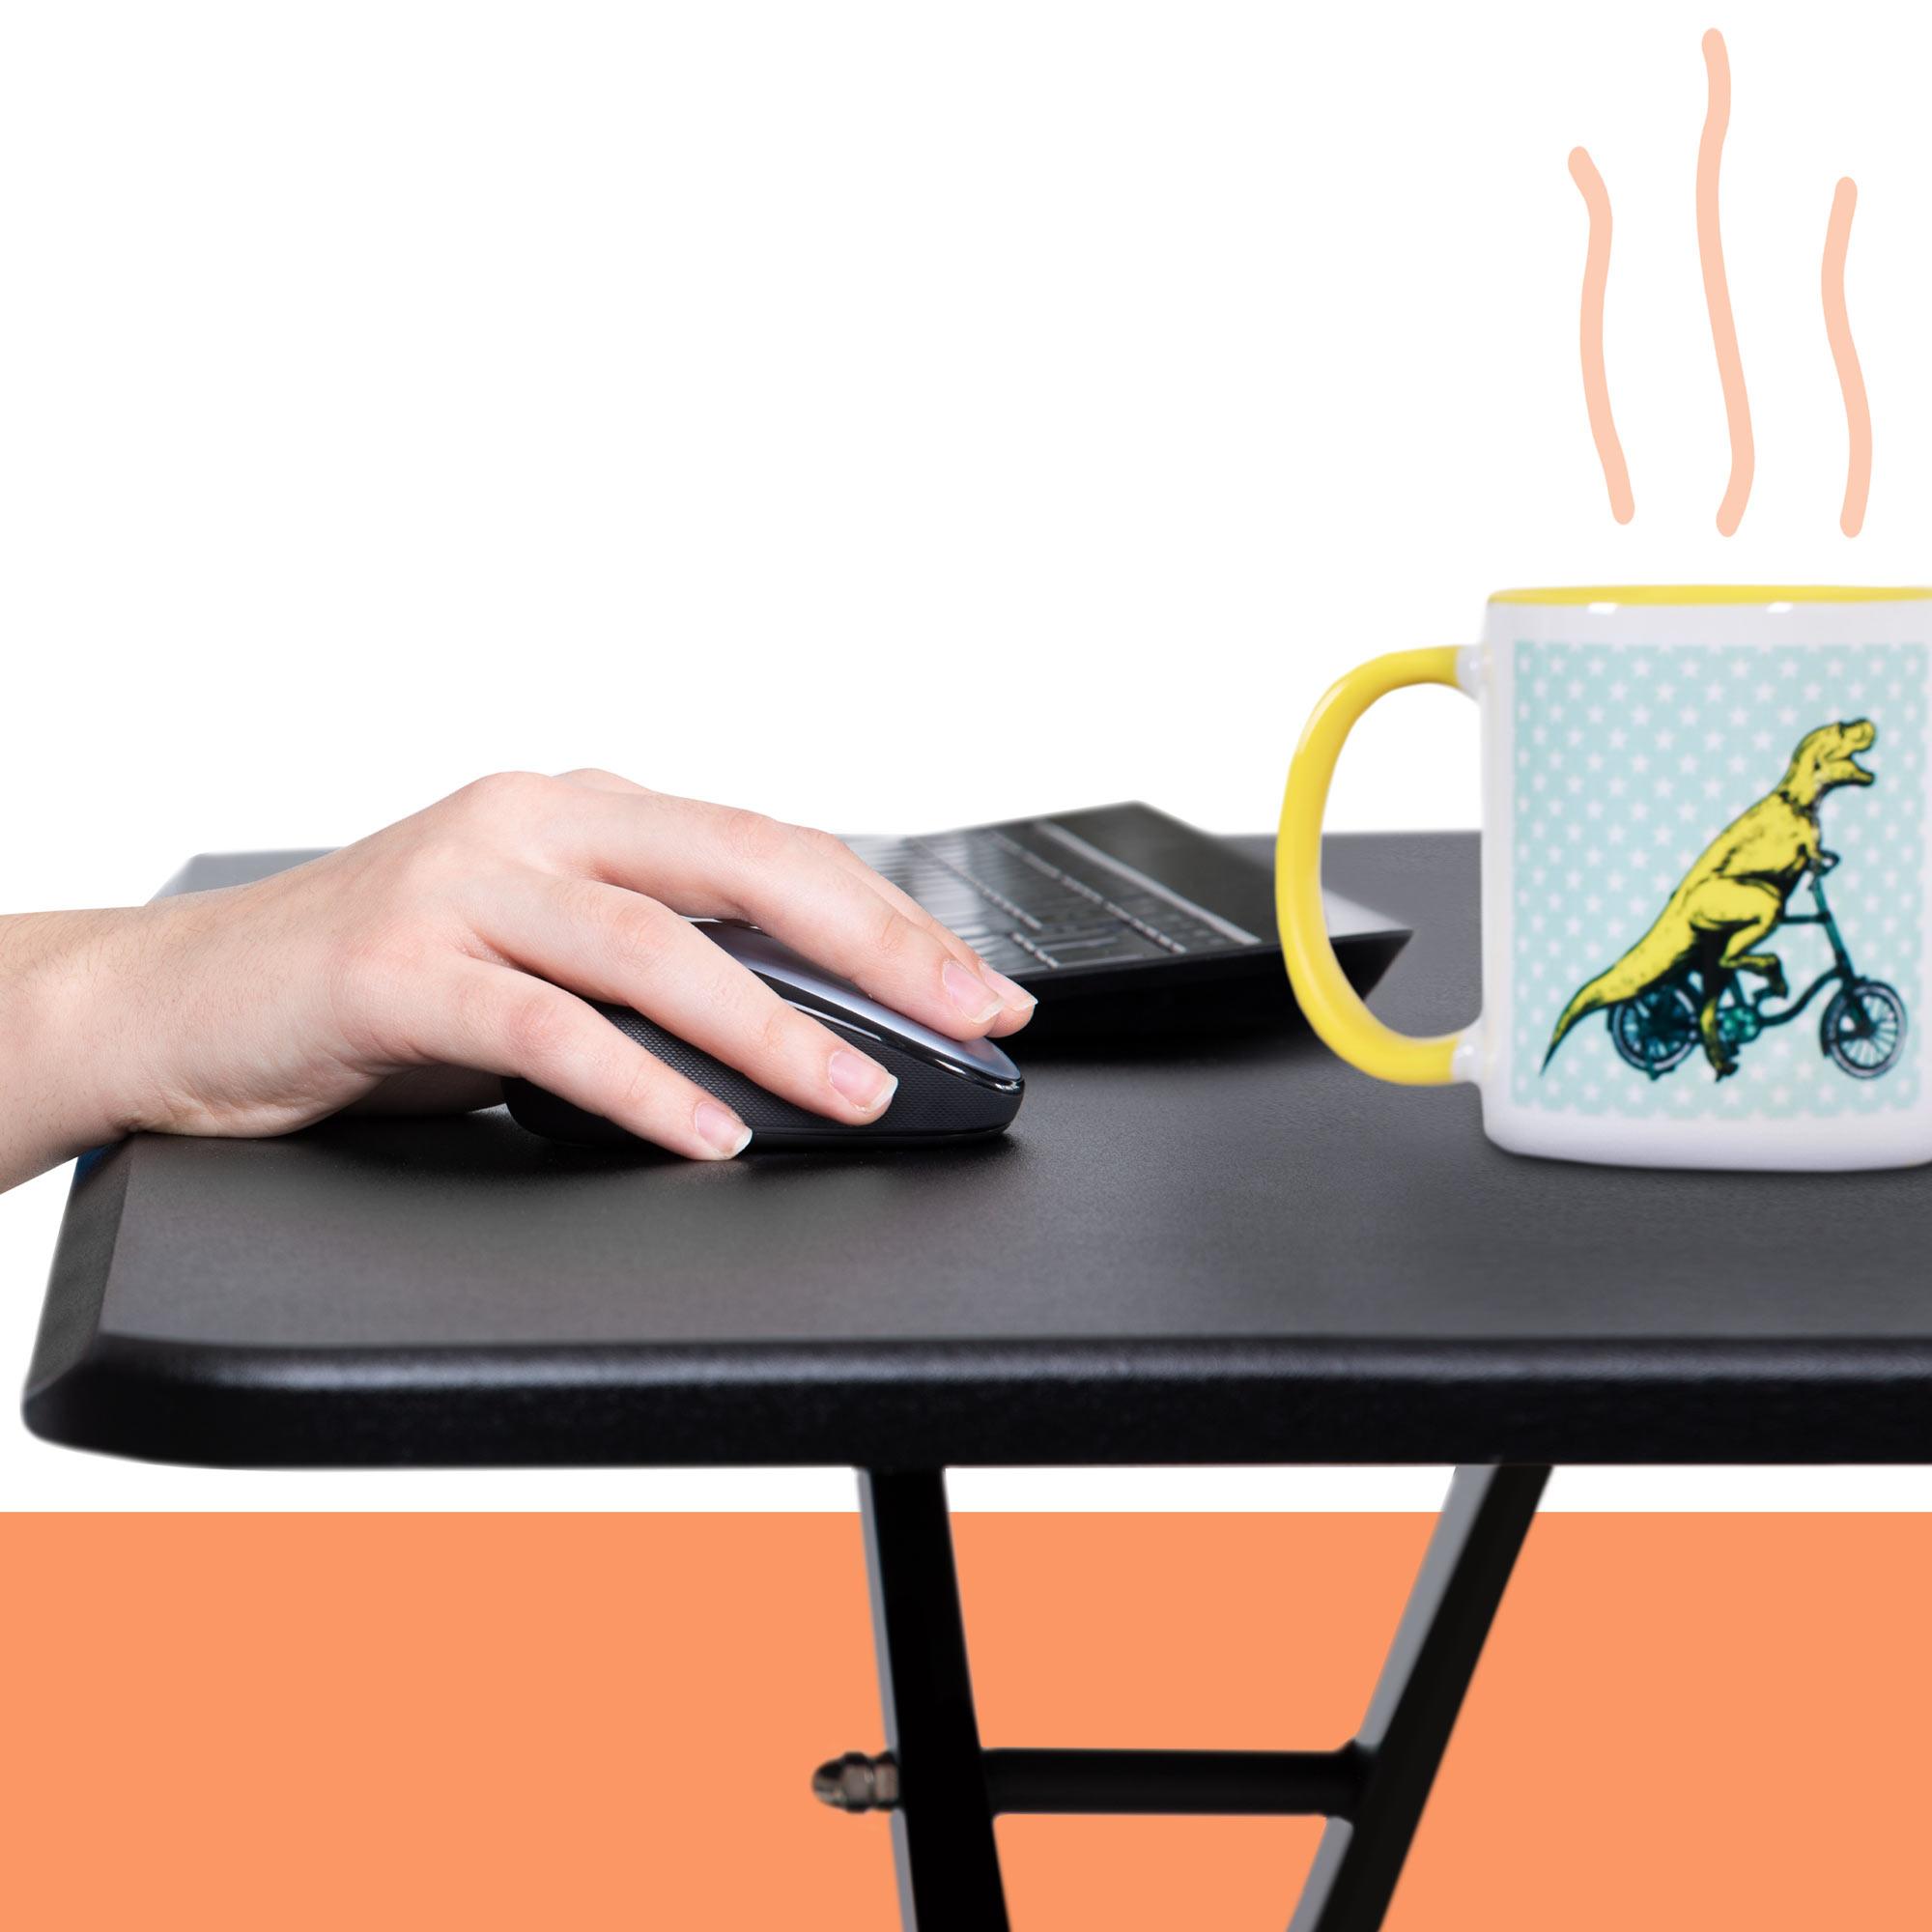 Go Ahead, Spill Your Coffee